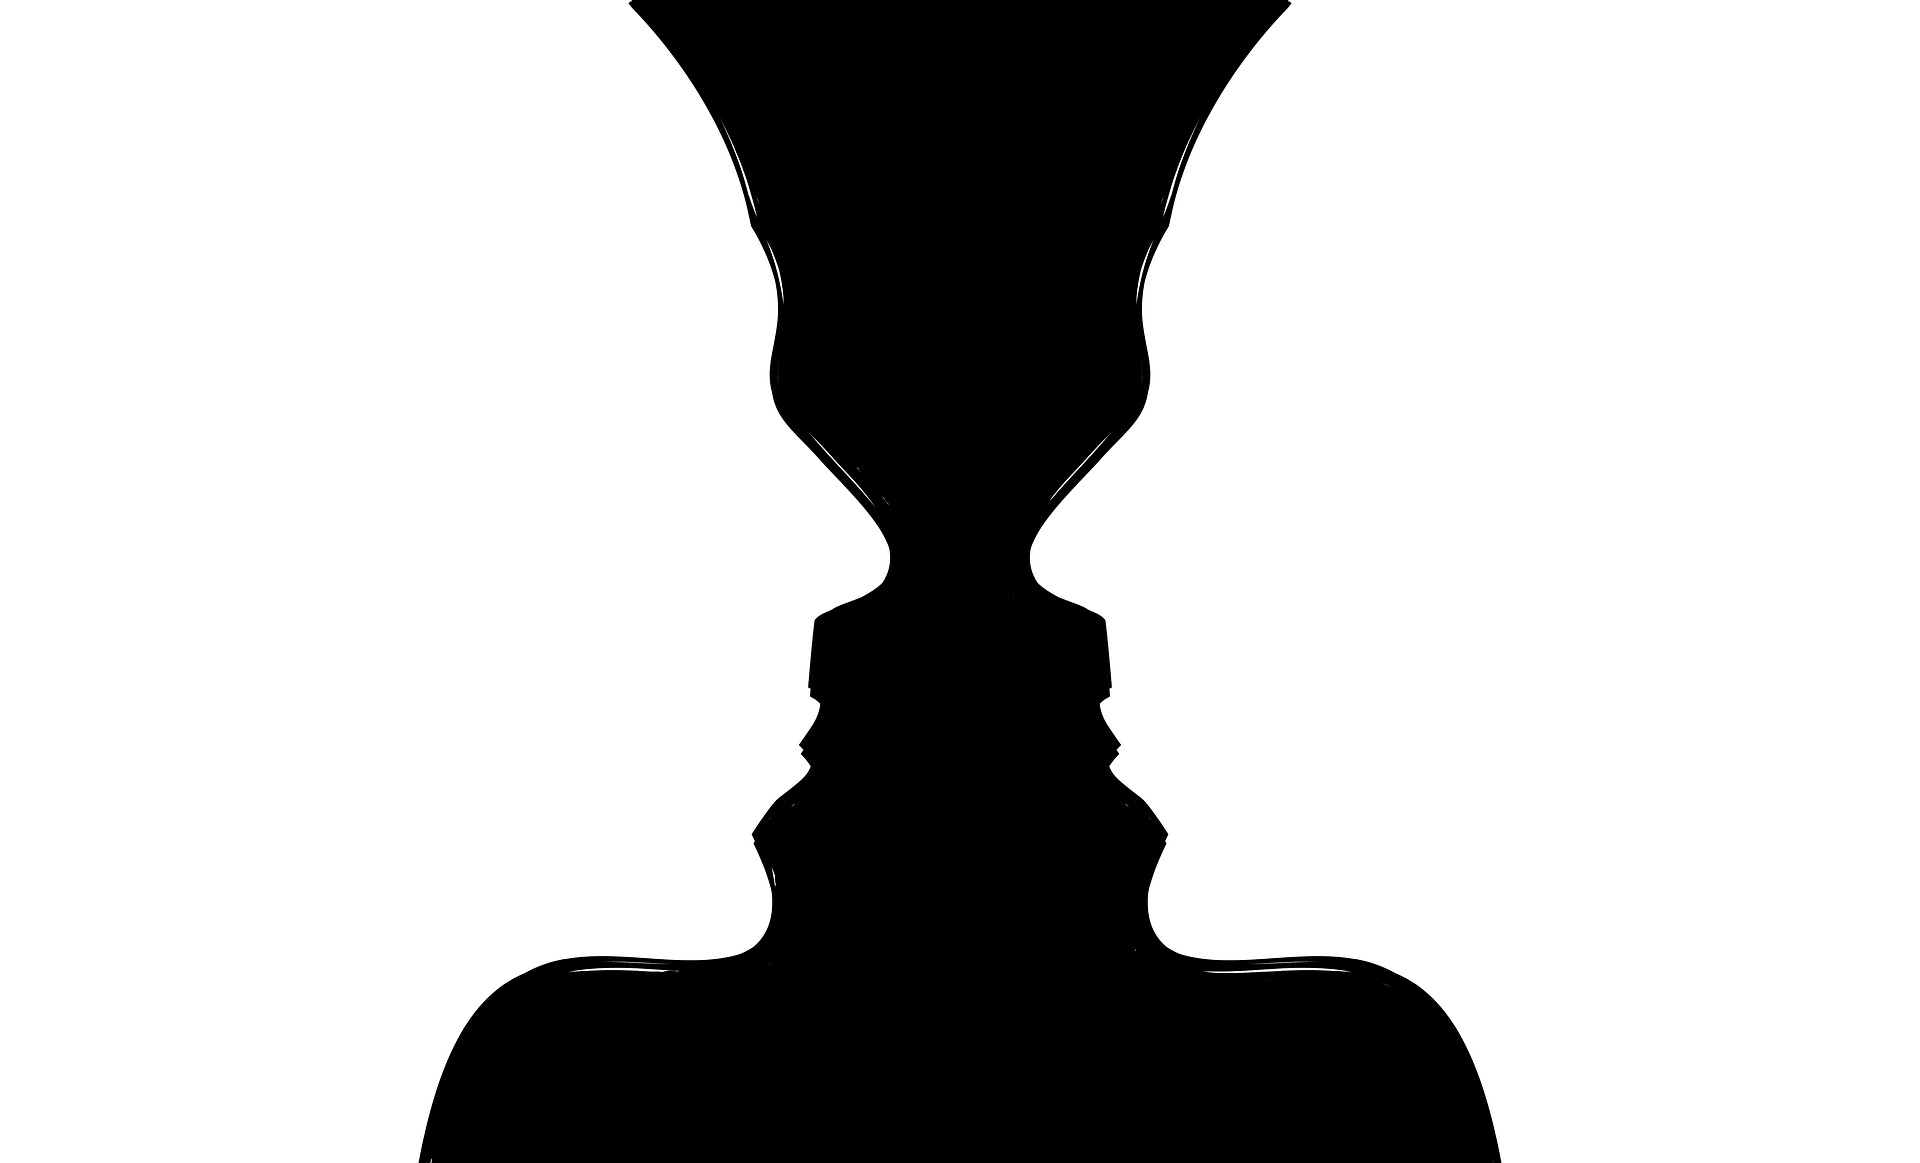 head-1965675_1920